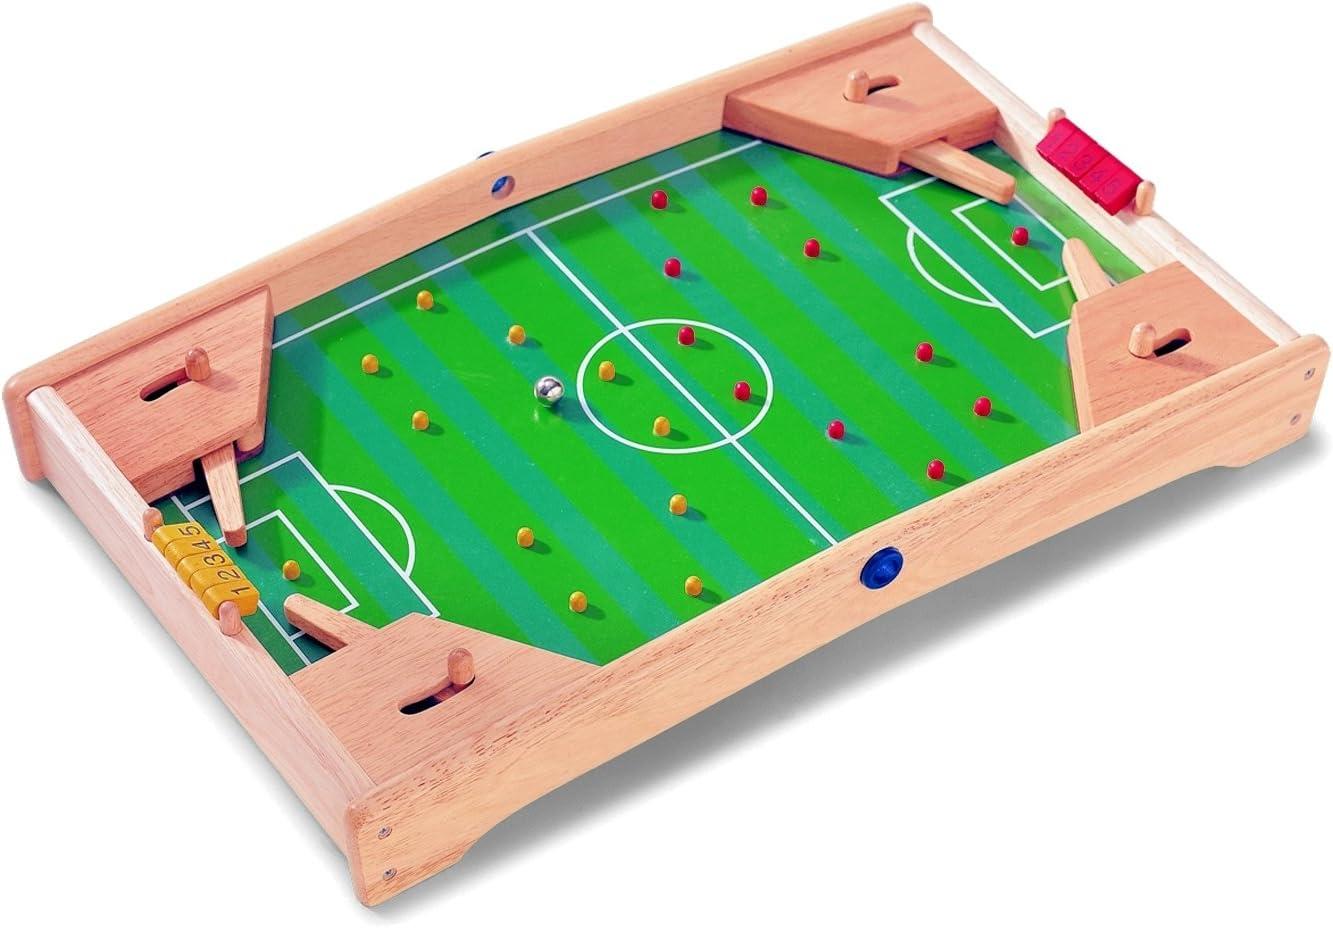 Fútbol – Flipper de Pintoy – 60 cm – Natural belassenes juguete de madera maciza – Juego de habilidad para 2 jugadores de fútbol – Mesa Flipper futbolín de madera fussballtisch –